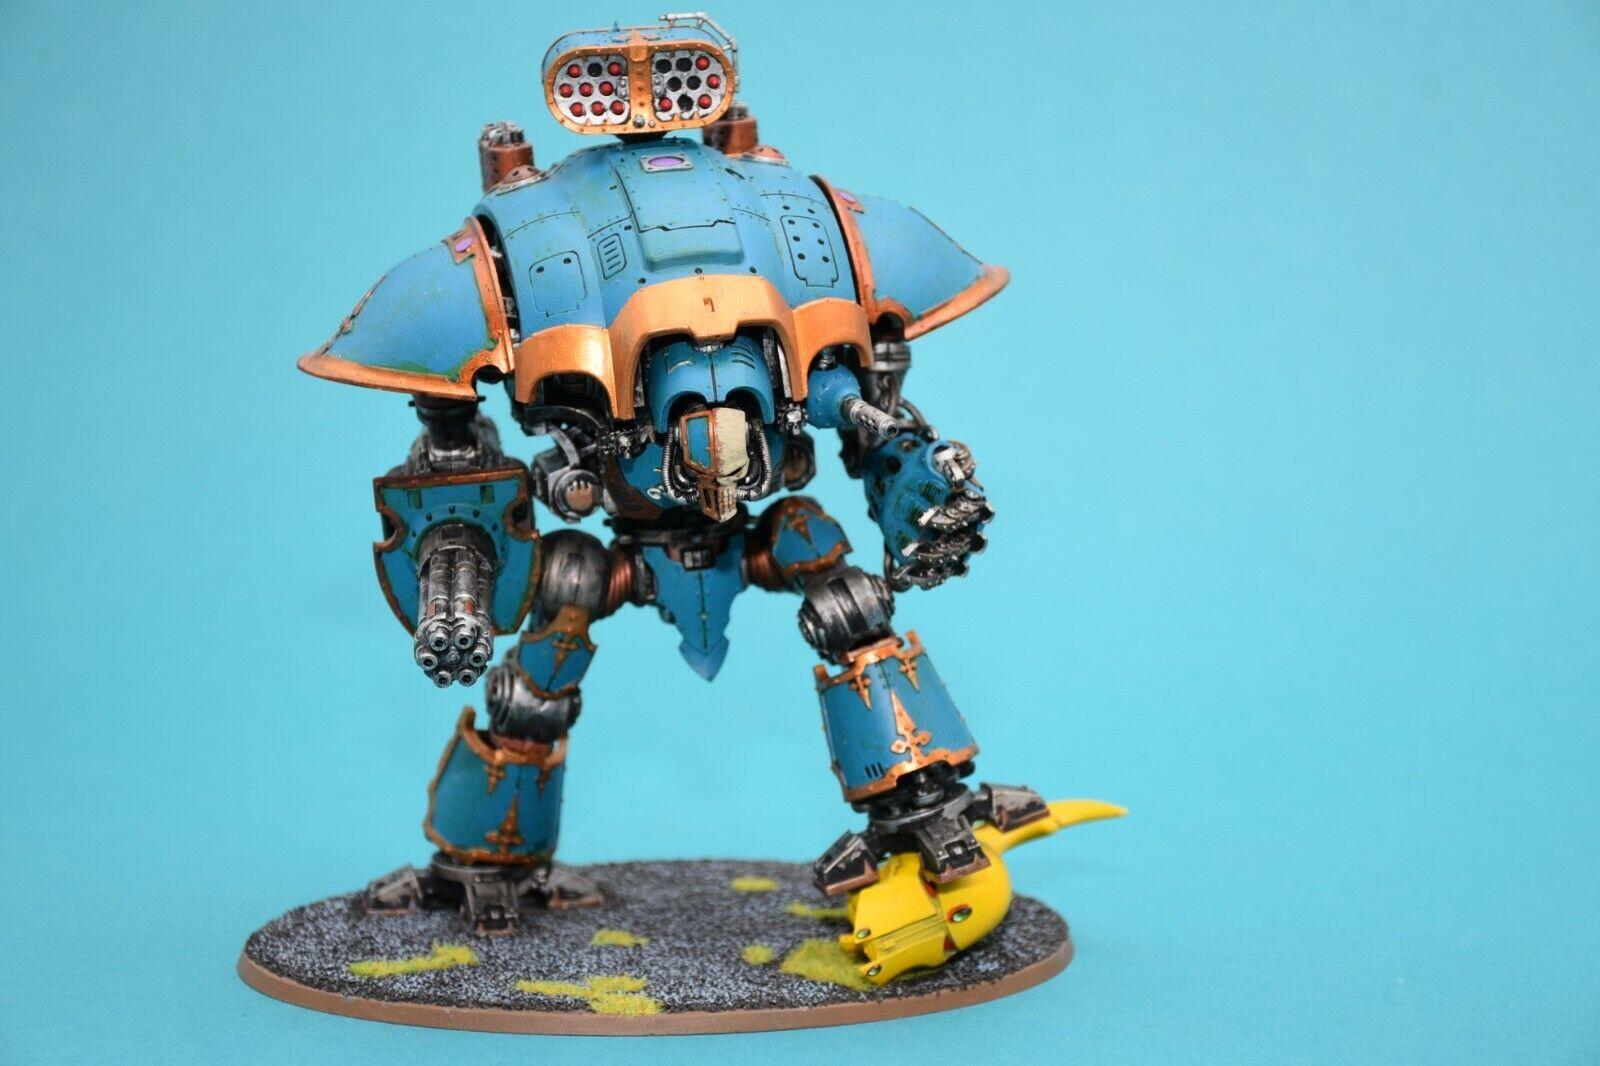 Warhammer 40k imperial Knight  Warden Chaos Knight-Painted  -  profitez de 50% de réduction